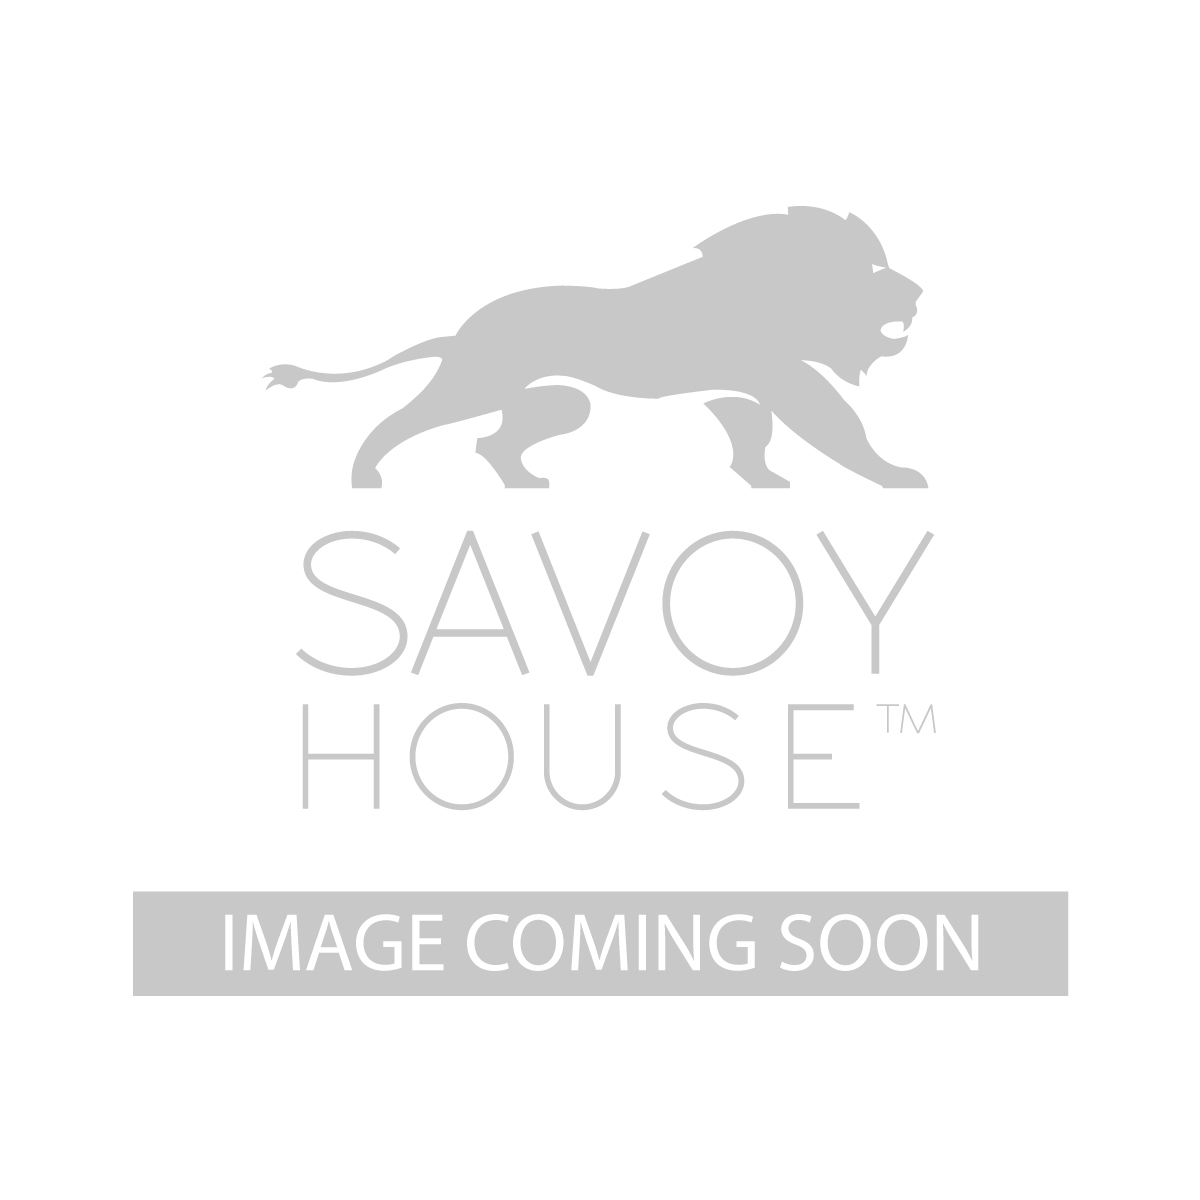 7 9006 3 Sn Akron 3 Light Pendant By Savoy House